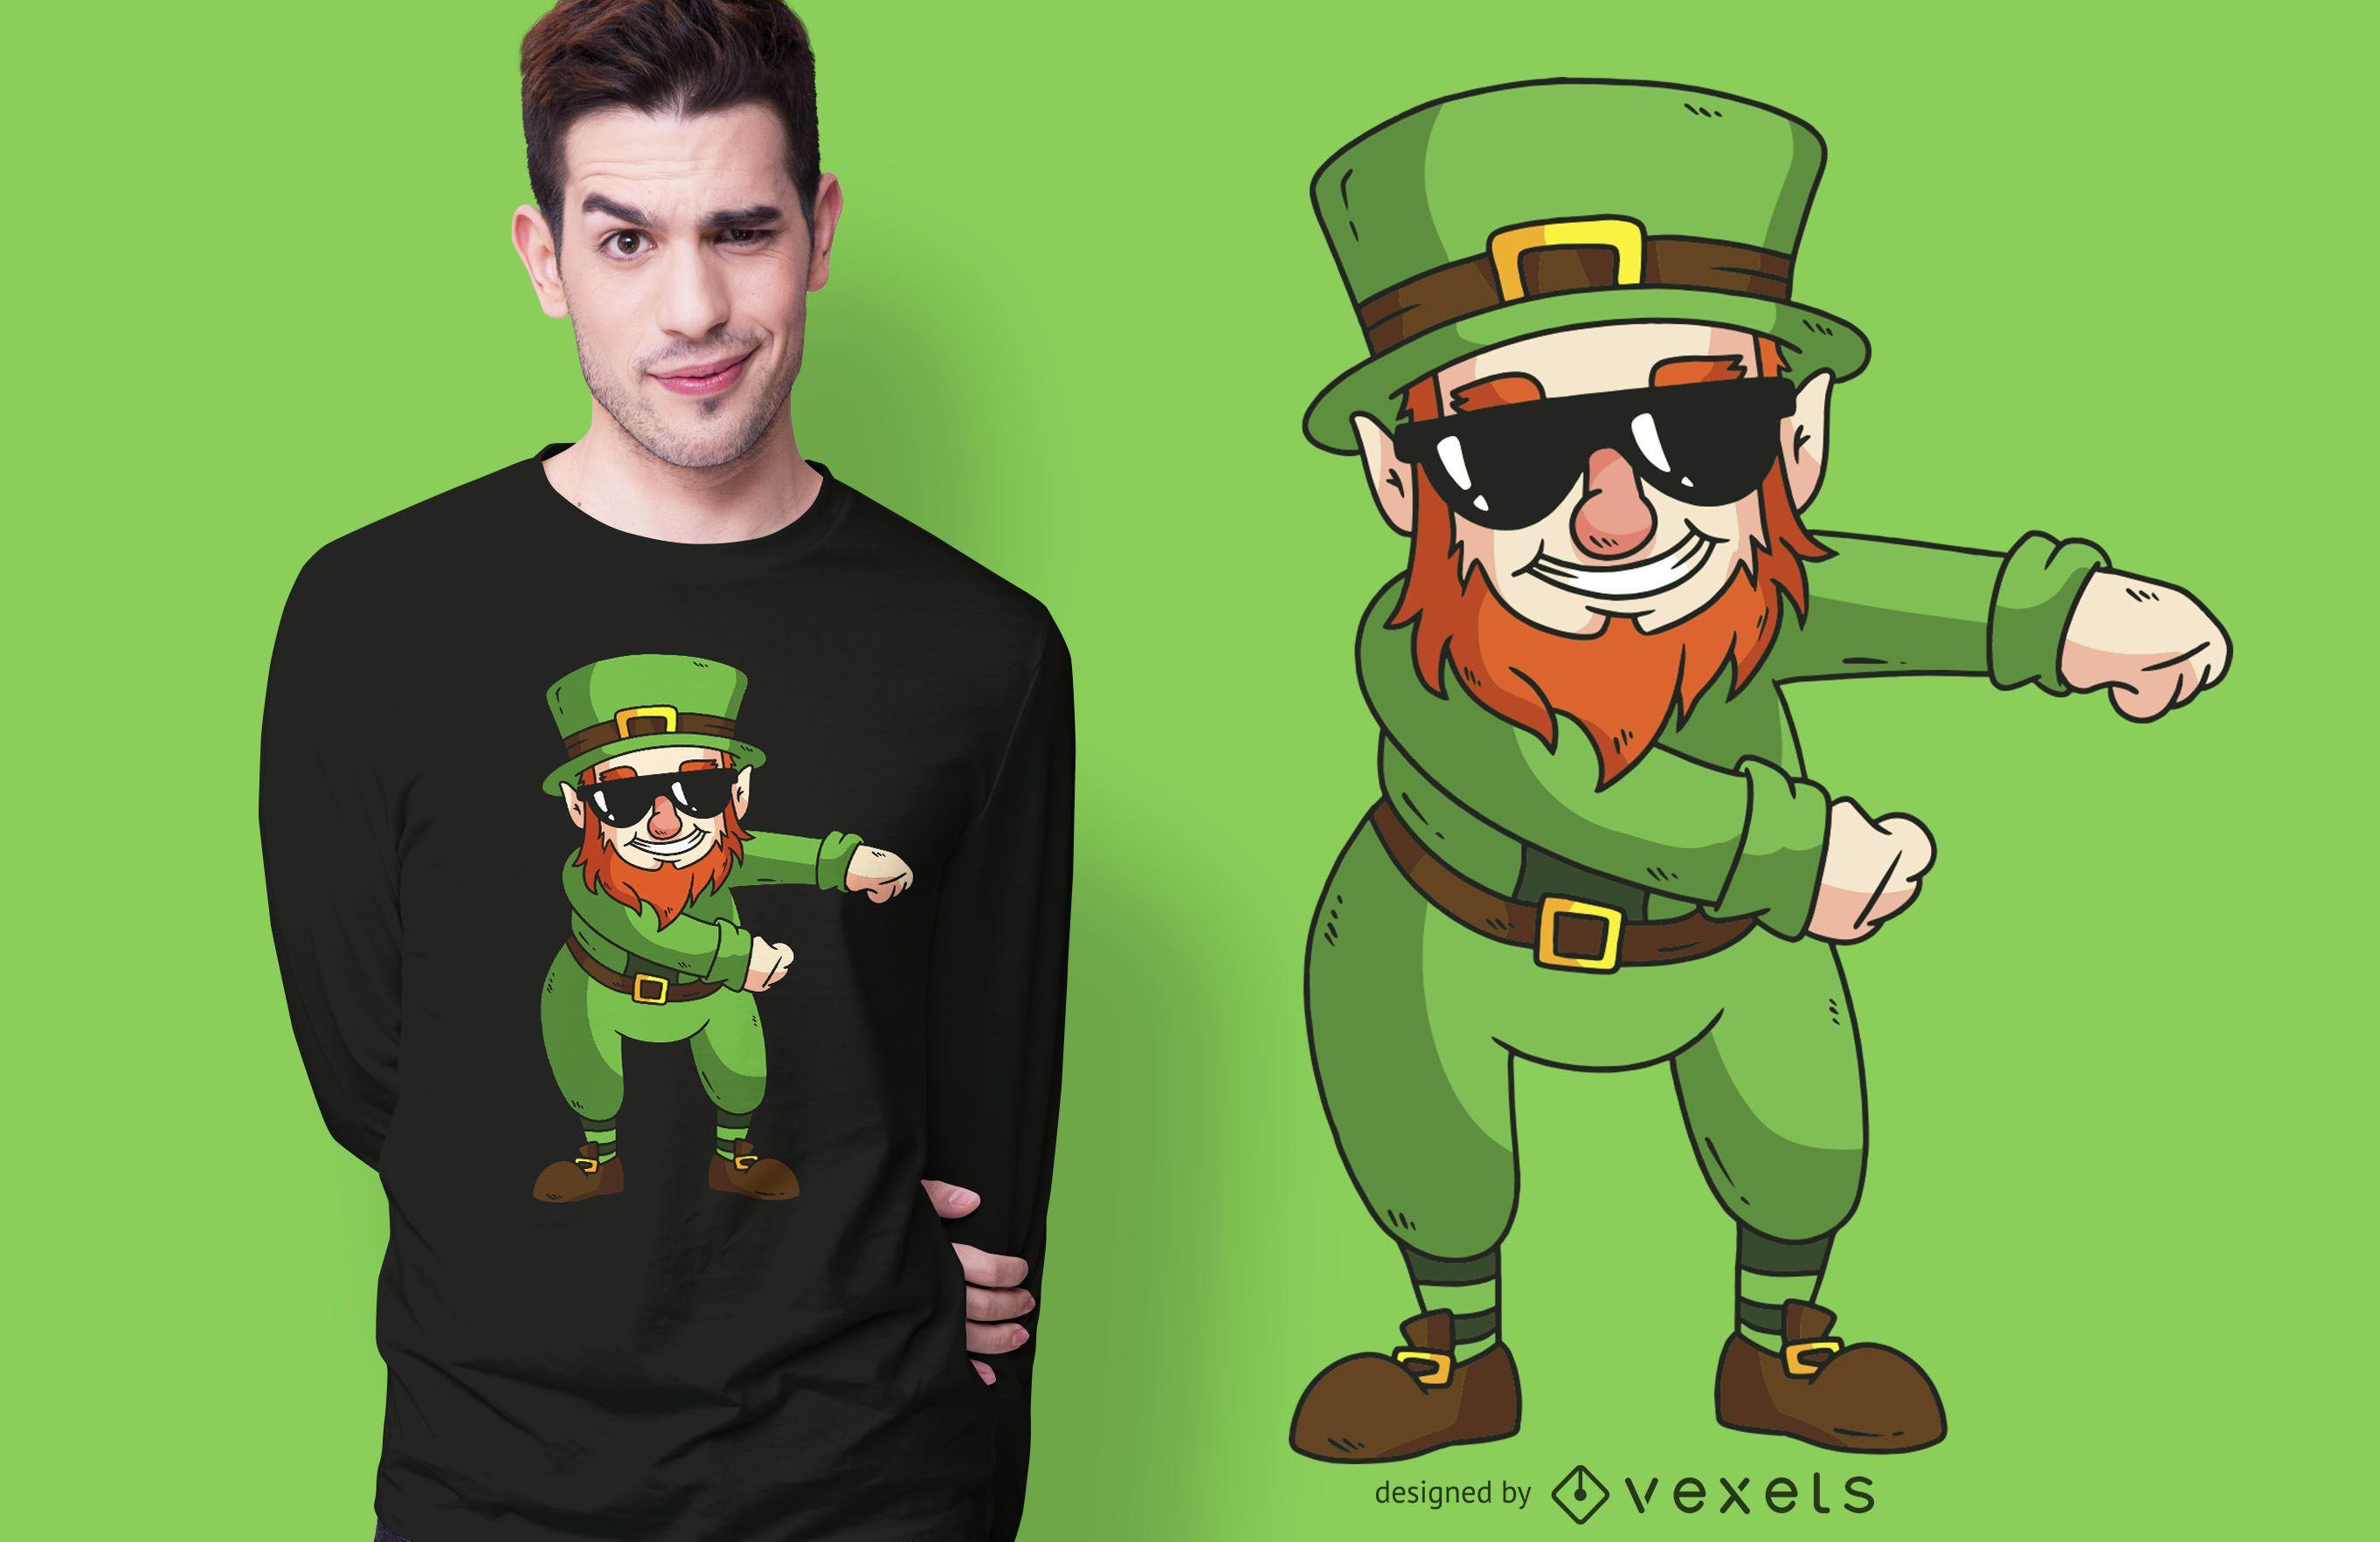 Kobold-Zahnseide-T-Shirt Design